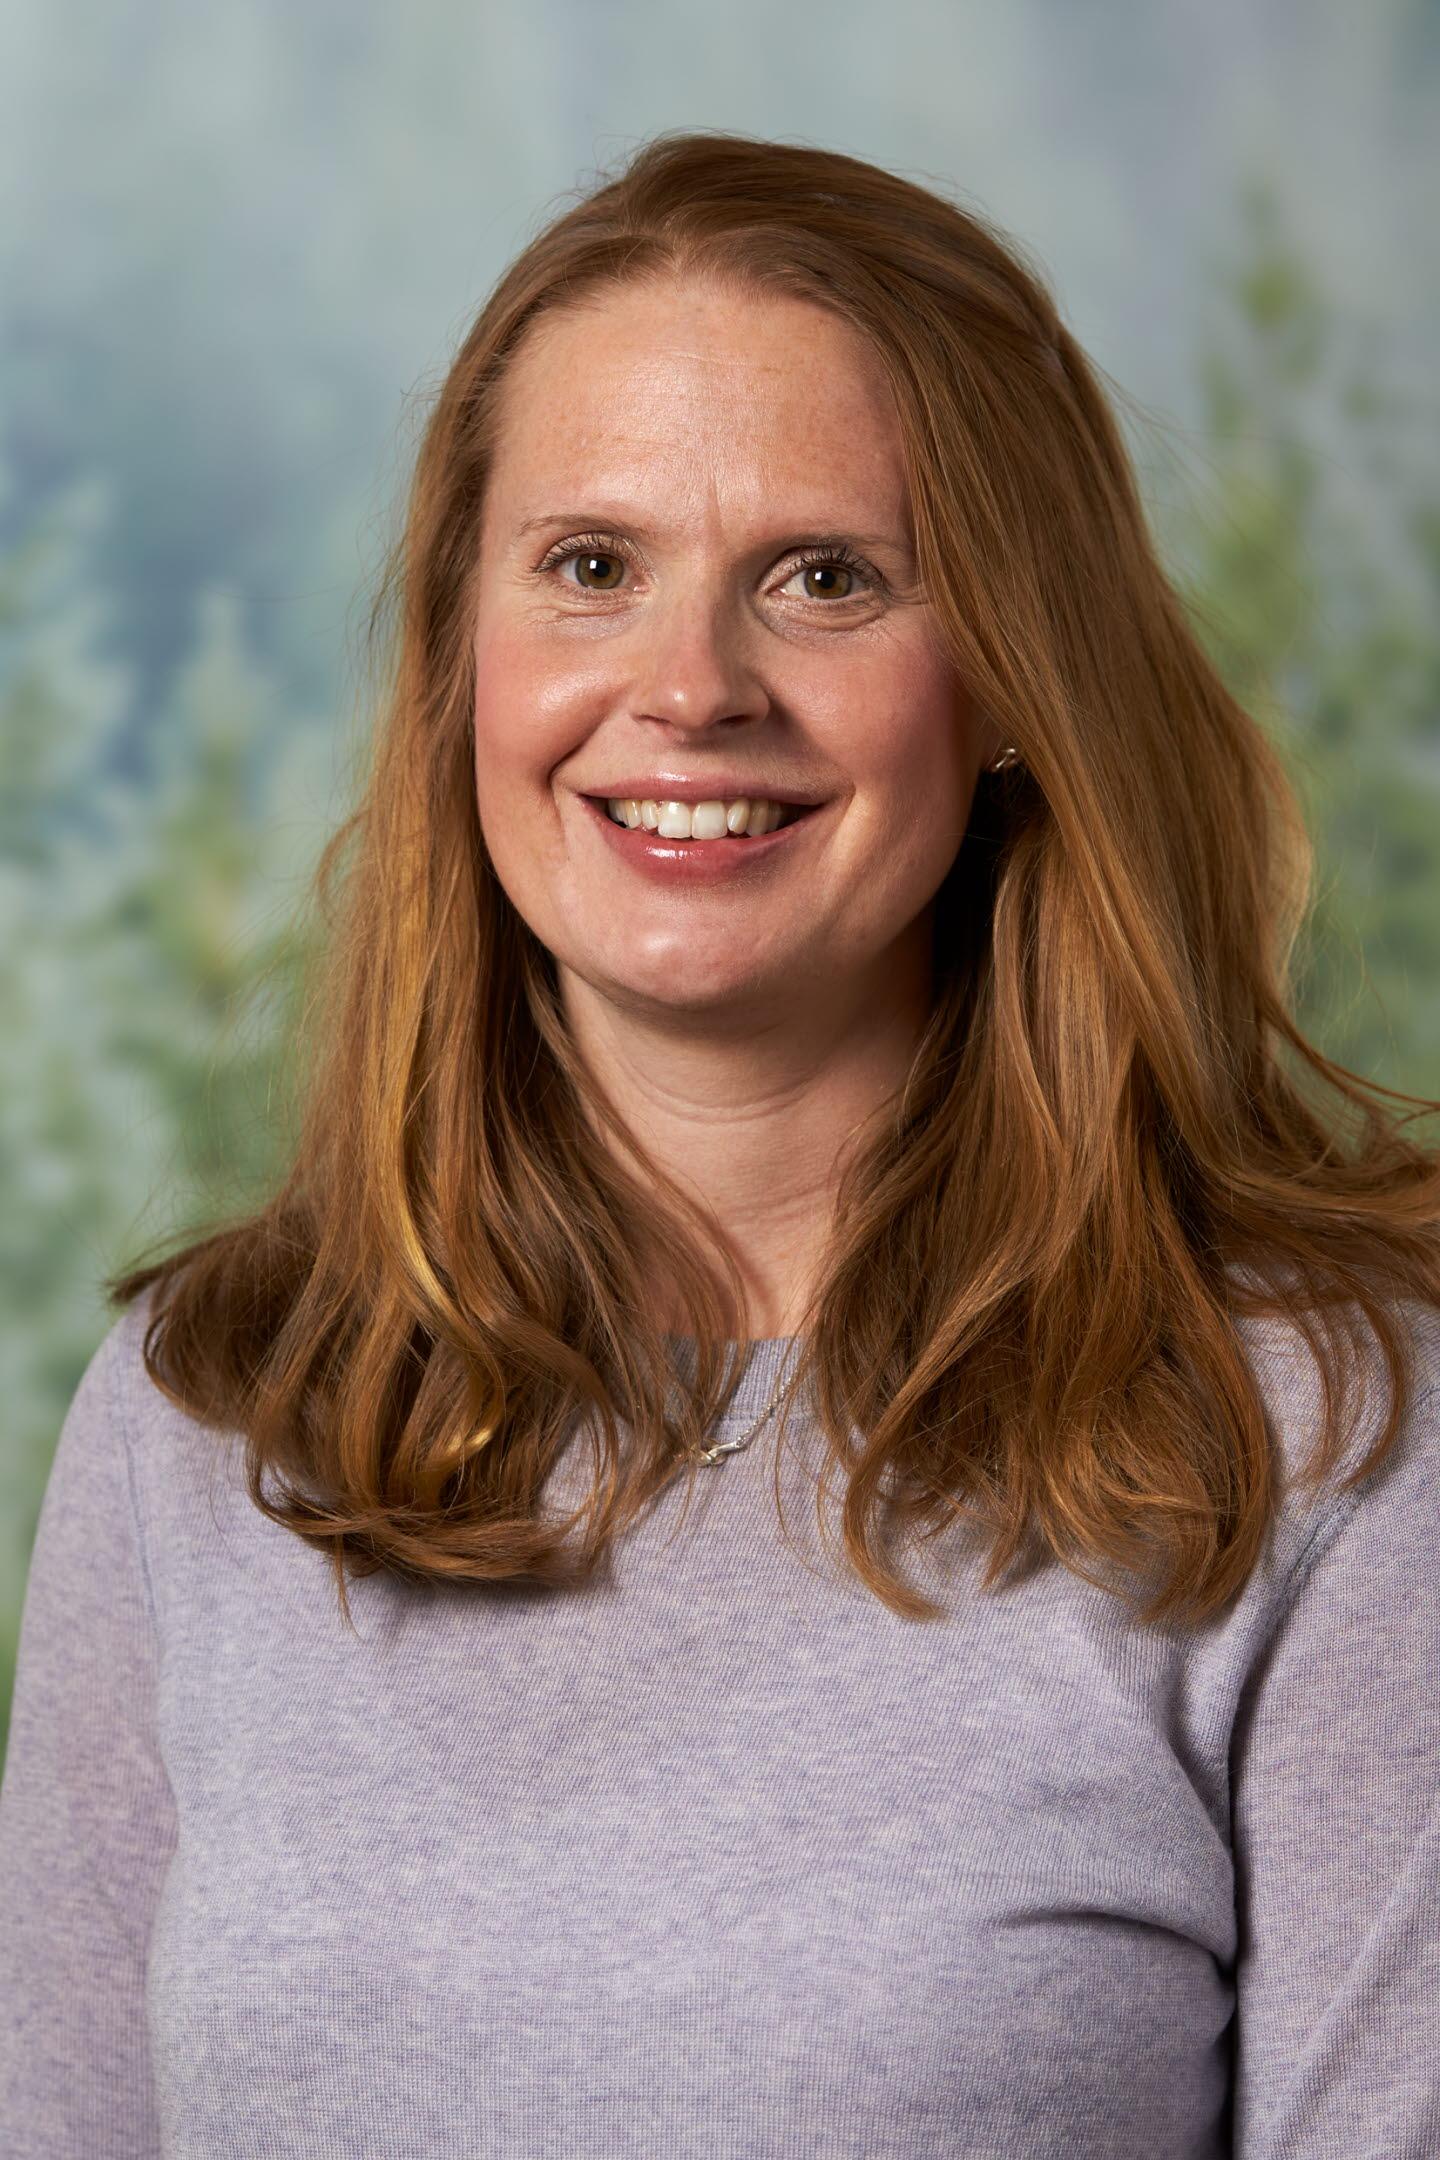 Anna Forshell